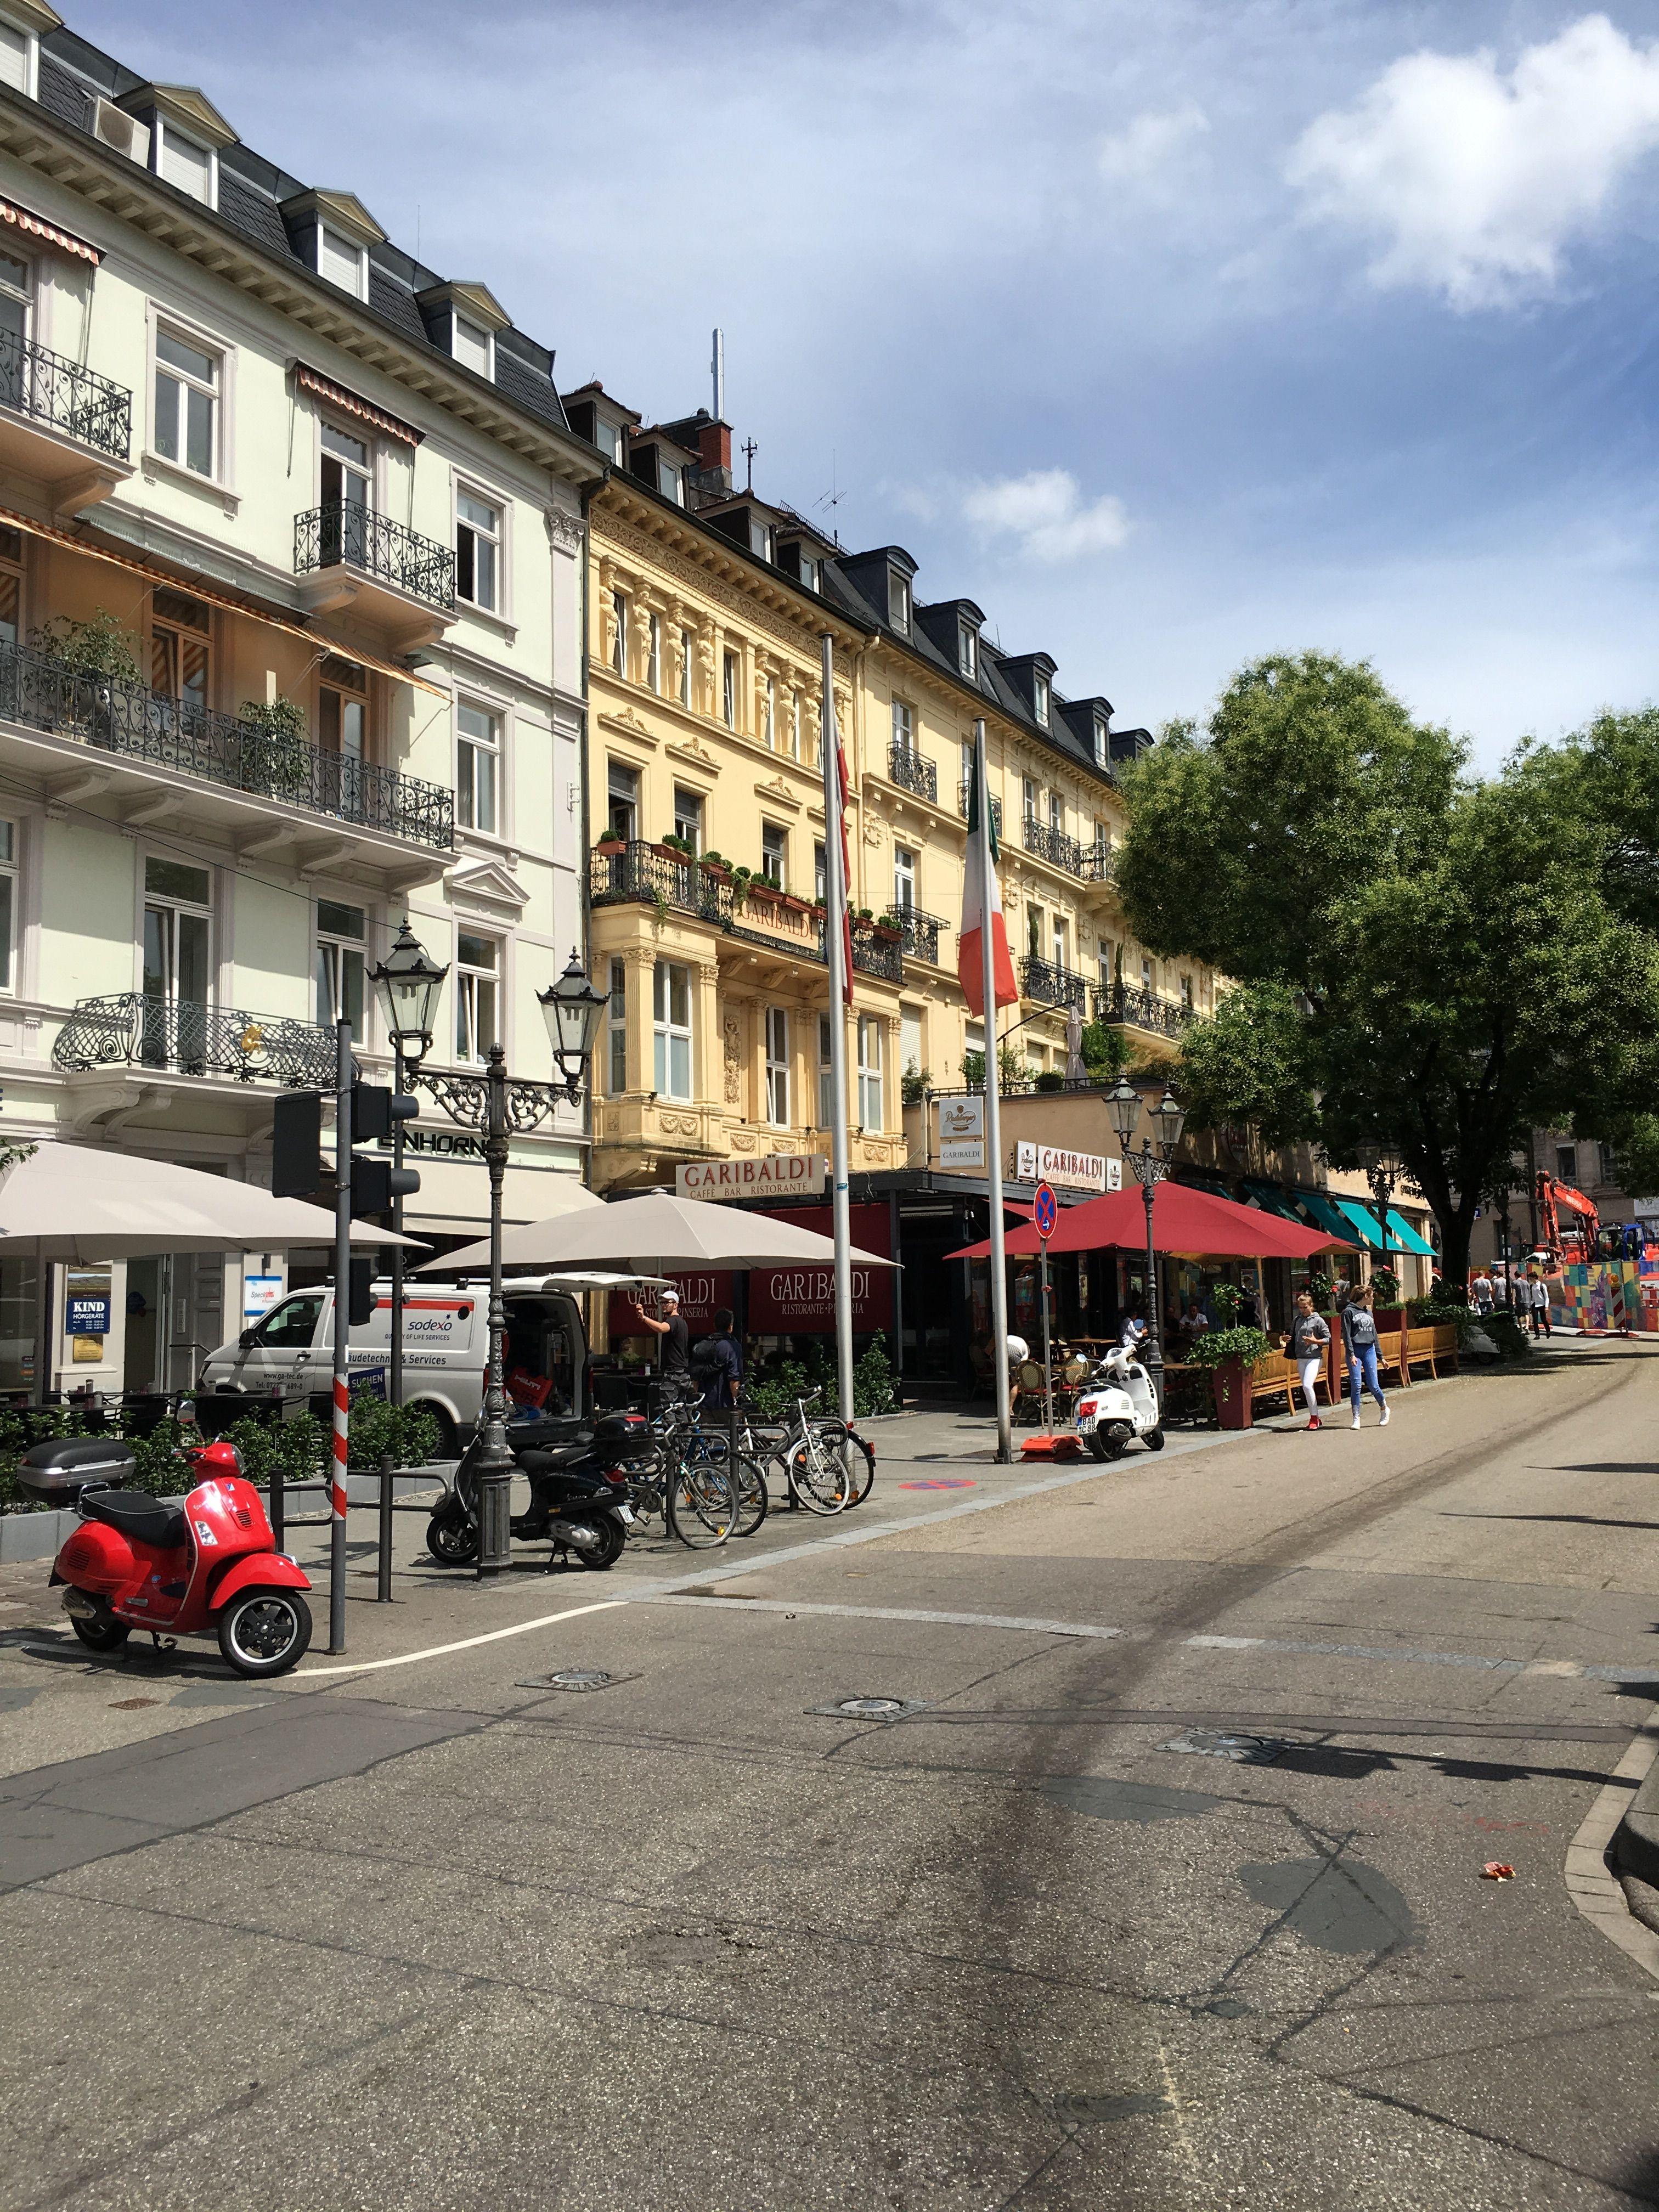 leopoldsplatz in baden baden just a few steps to the hotel am